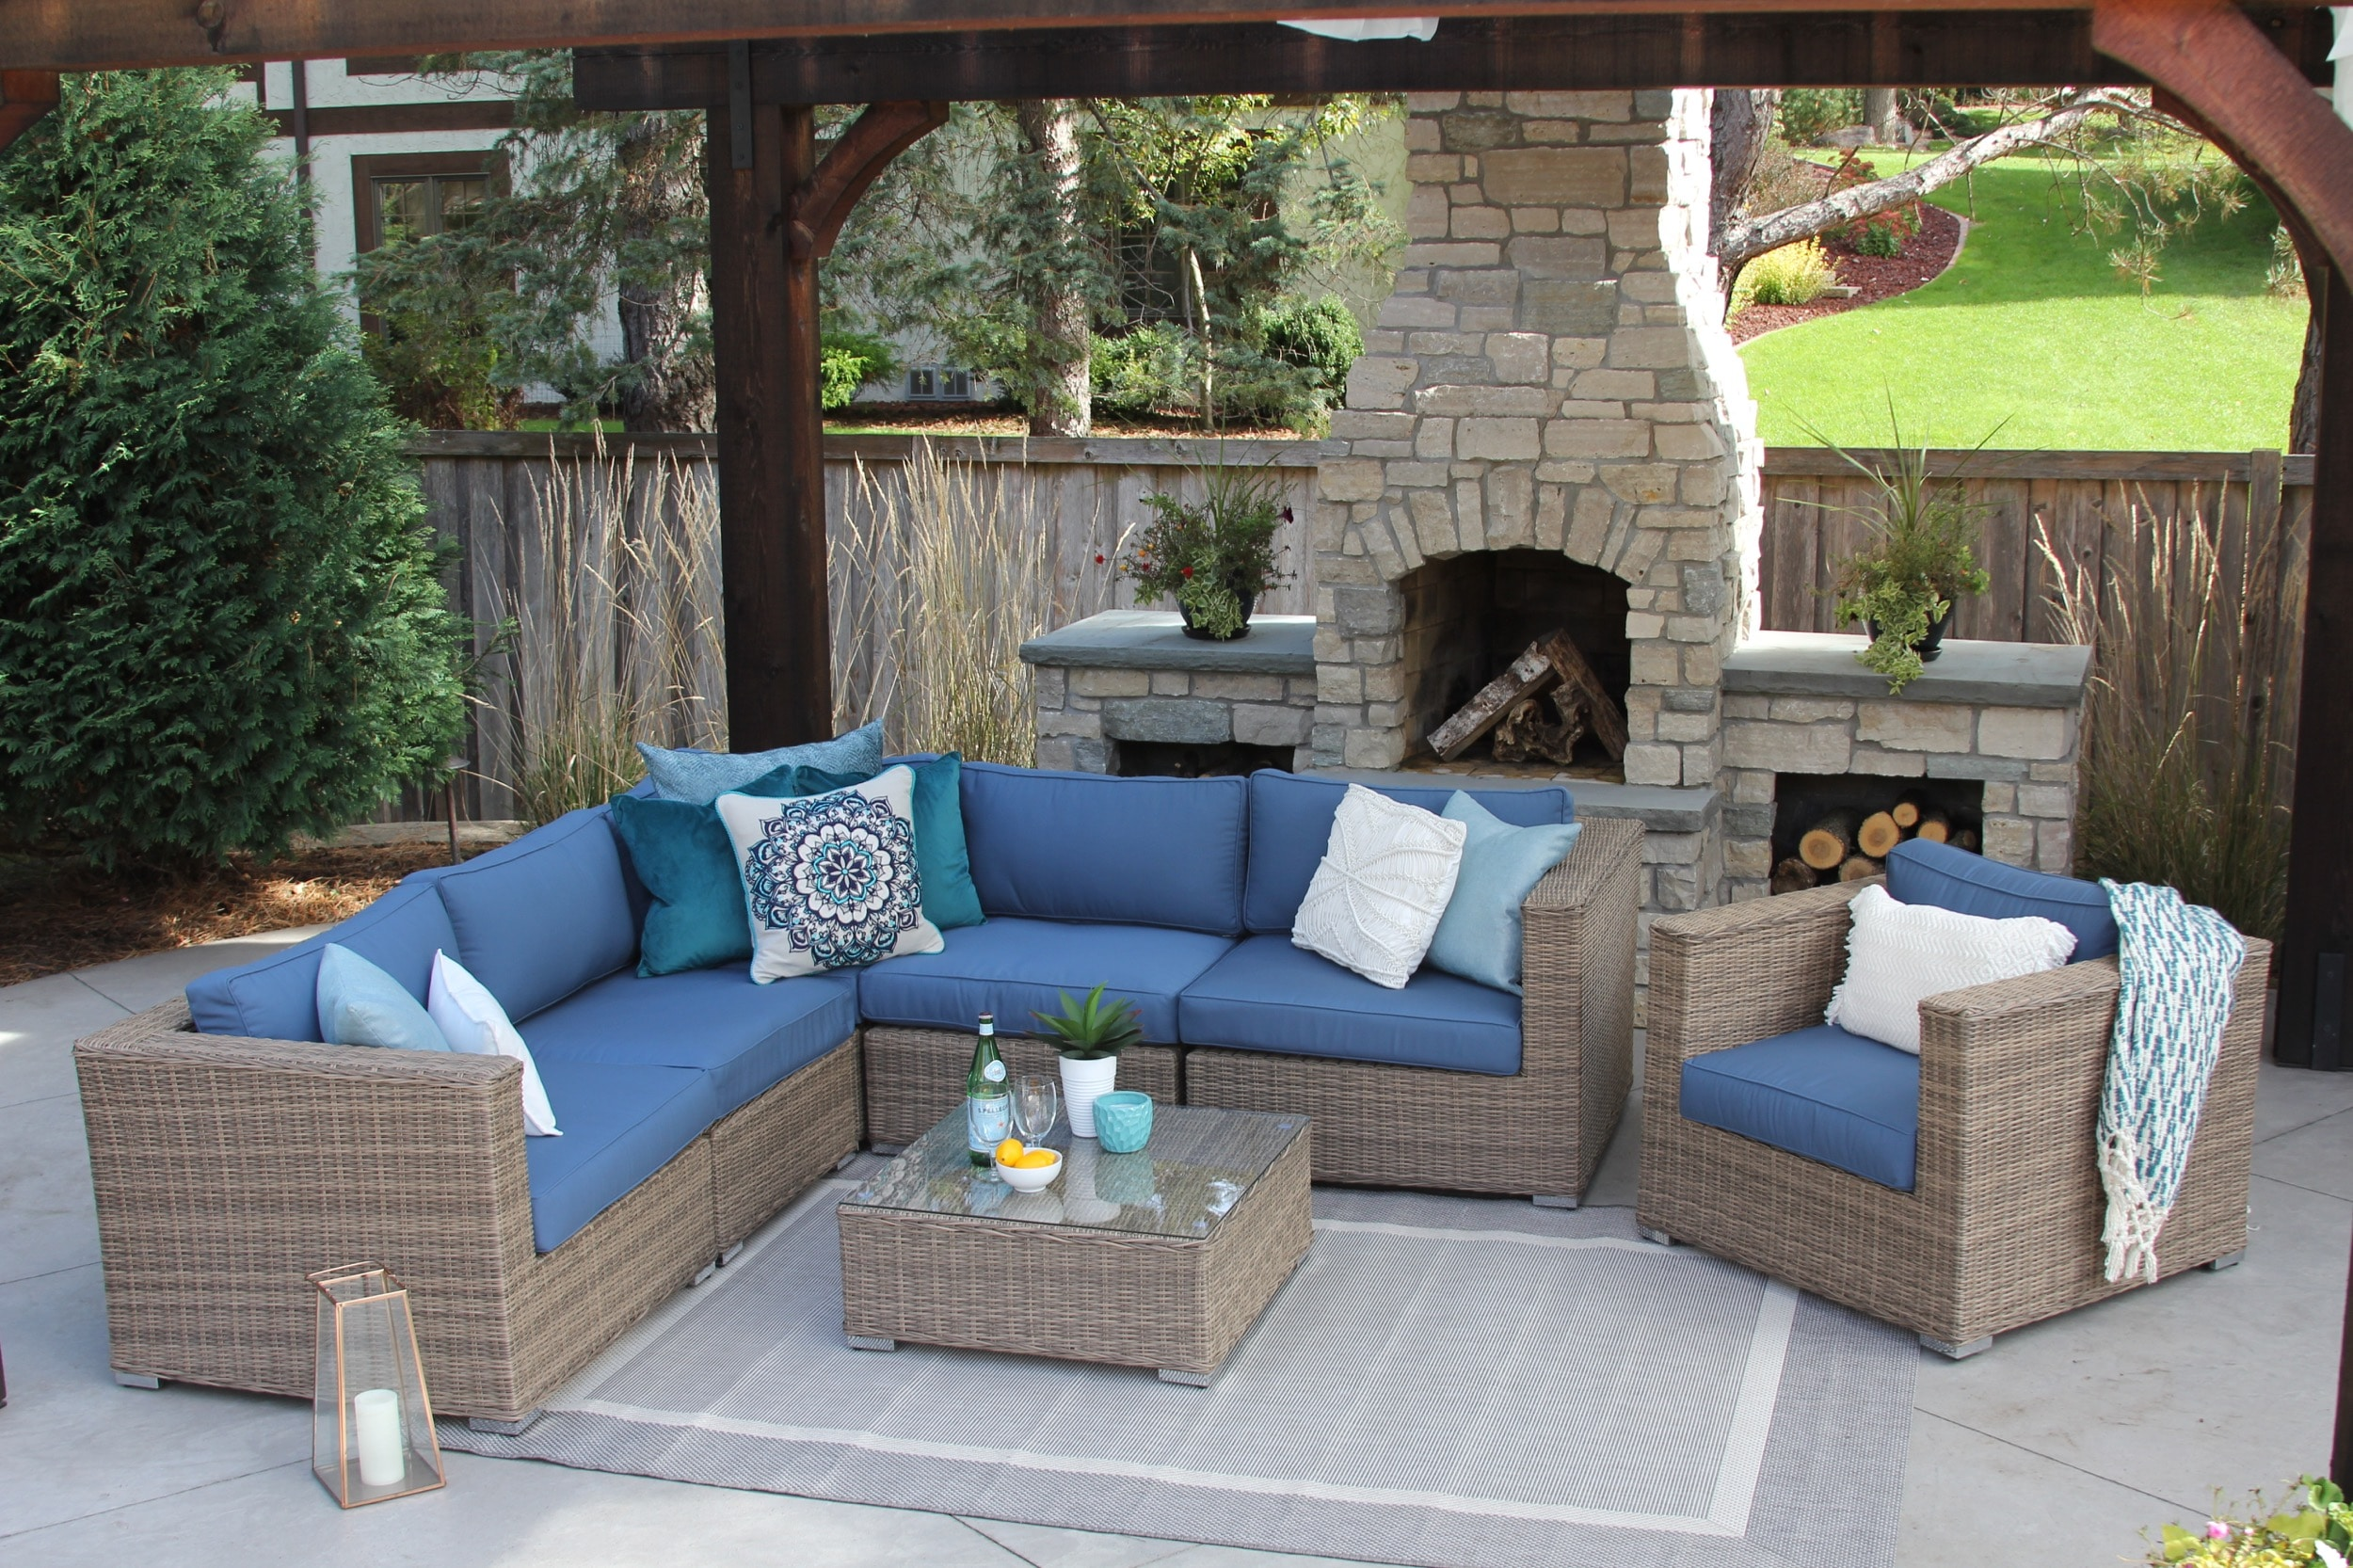 sunbrella addison 7 piece wicker patio sofa sectional meldecco patio furniture